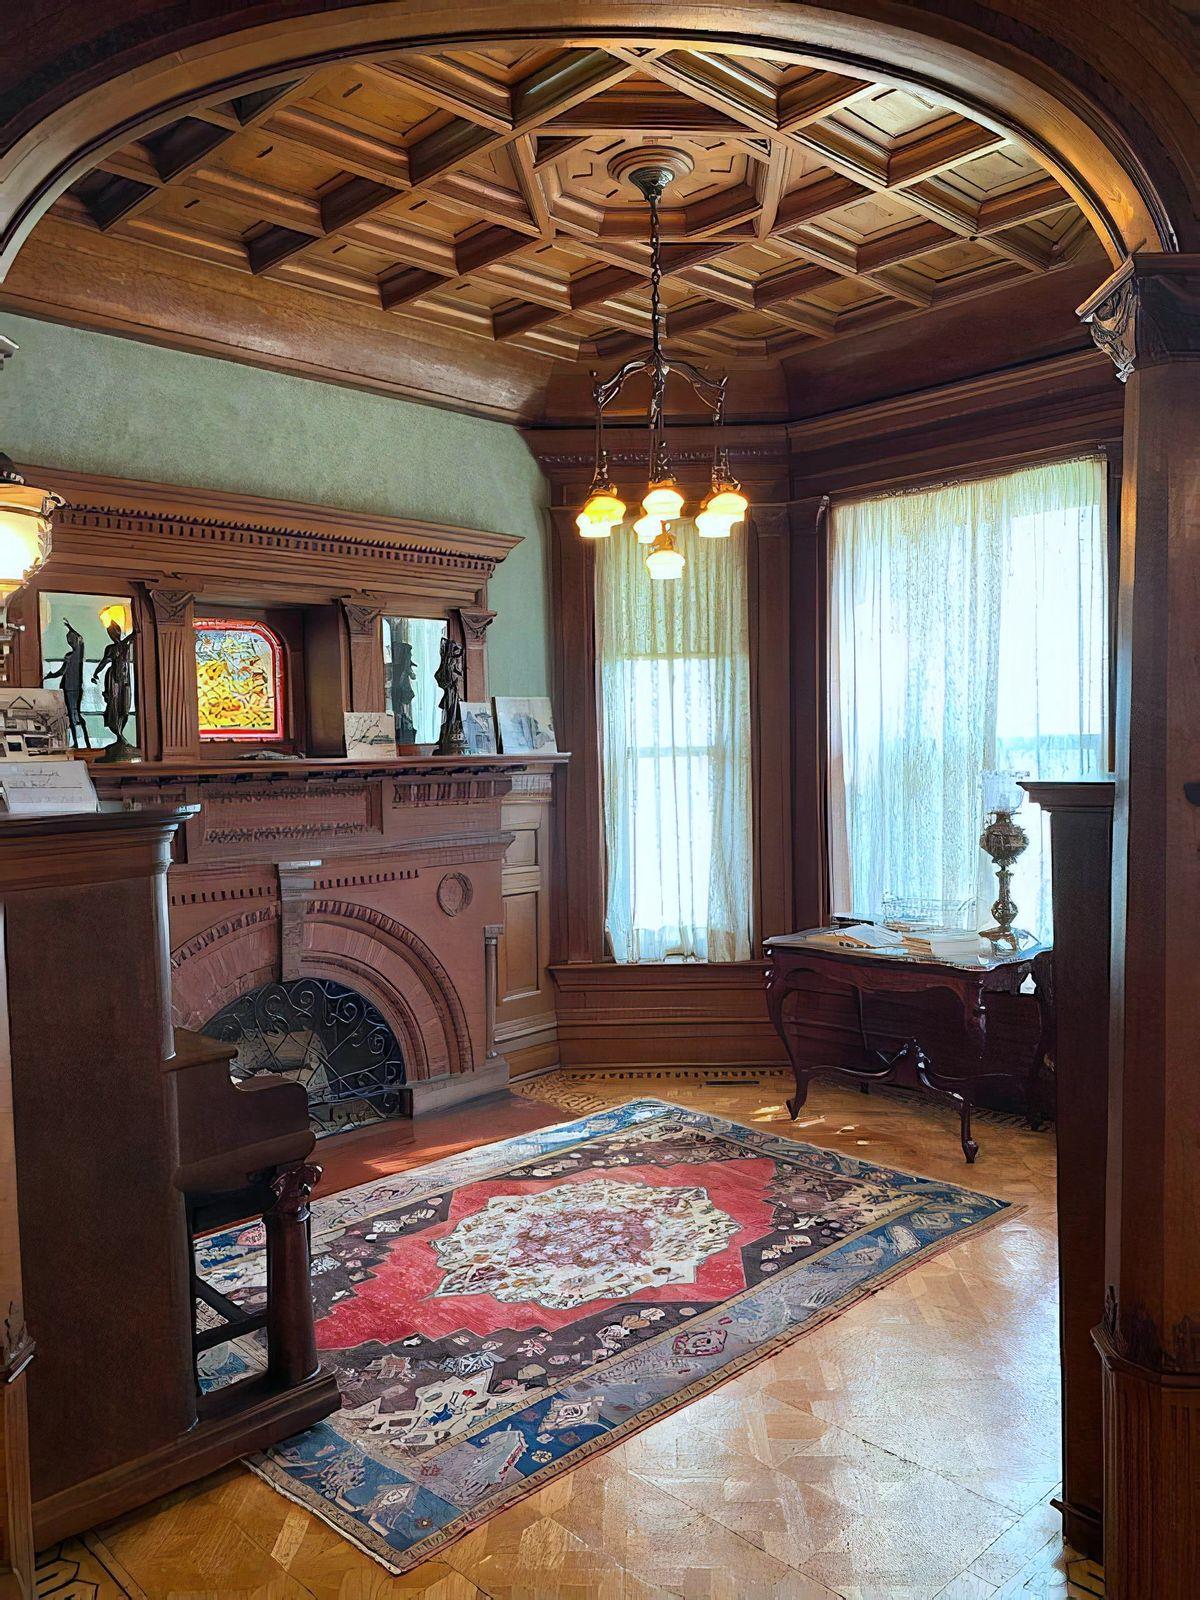 McFarland Historical Home Photo Video Shoot Location Dallas 01.jpg